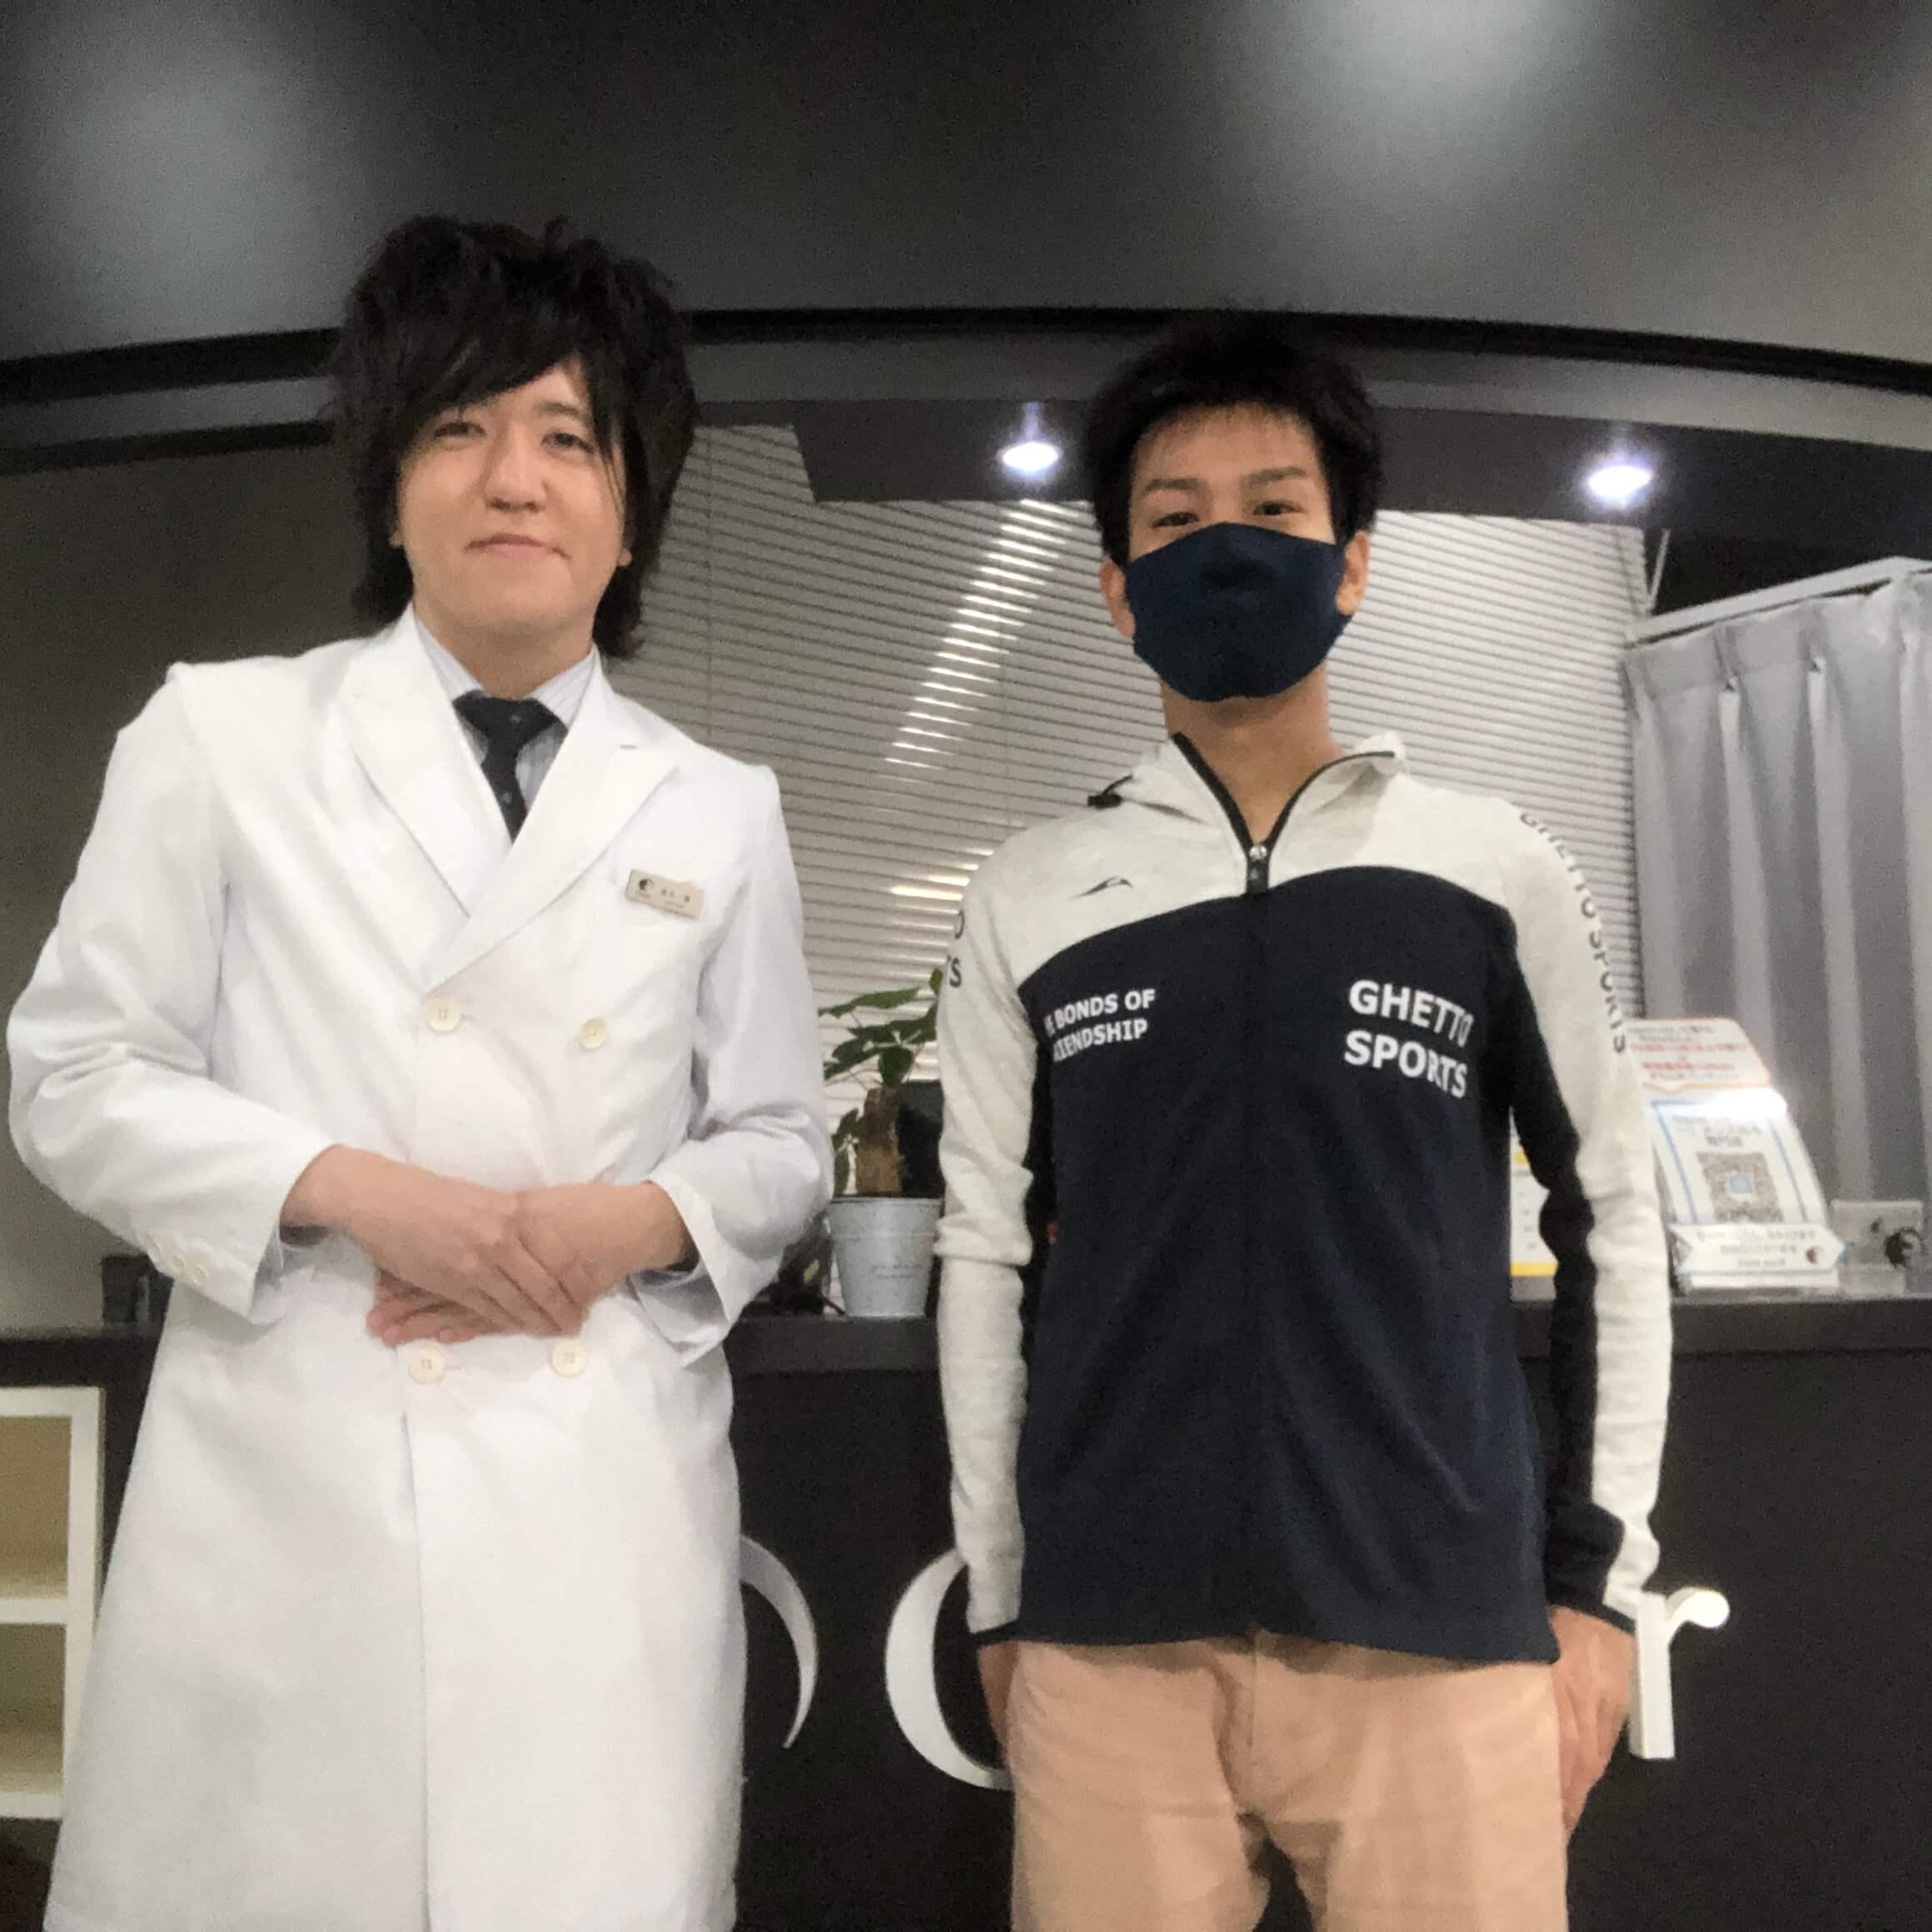 瀬戸市 T様 25歳会社員 全身脱毛(ヒゲ脱毛・VIO脱毛含む)